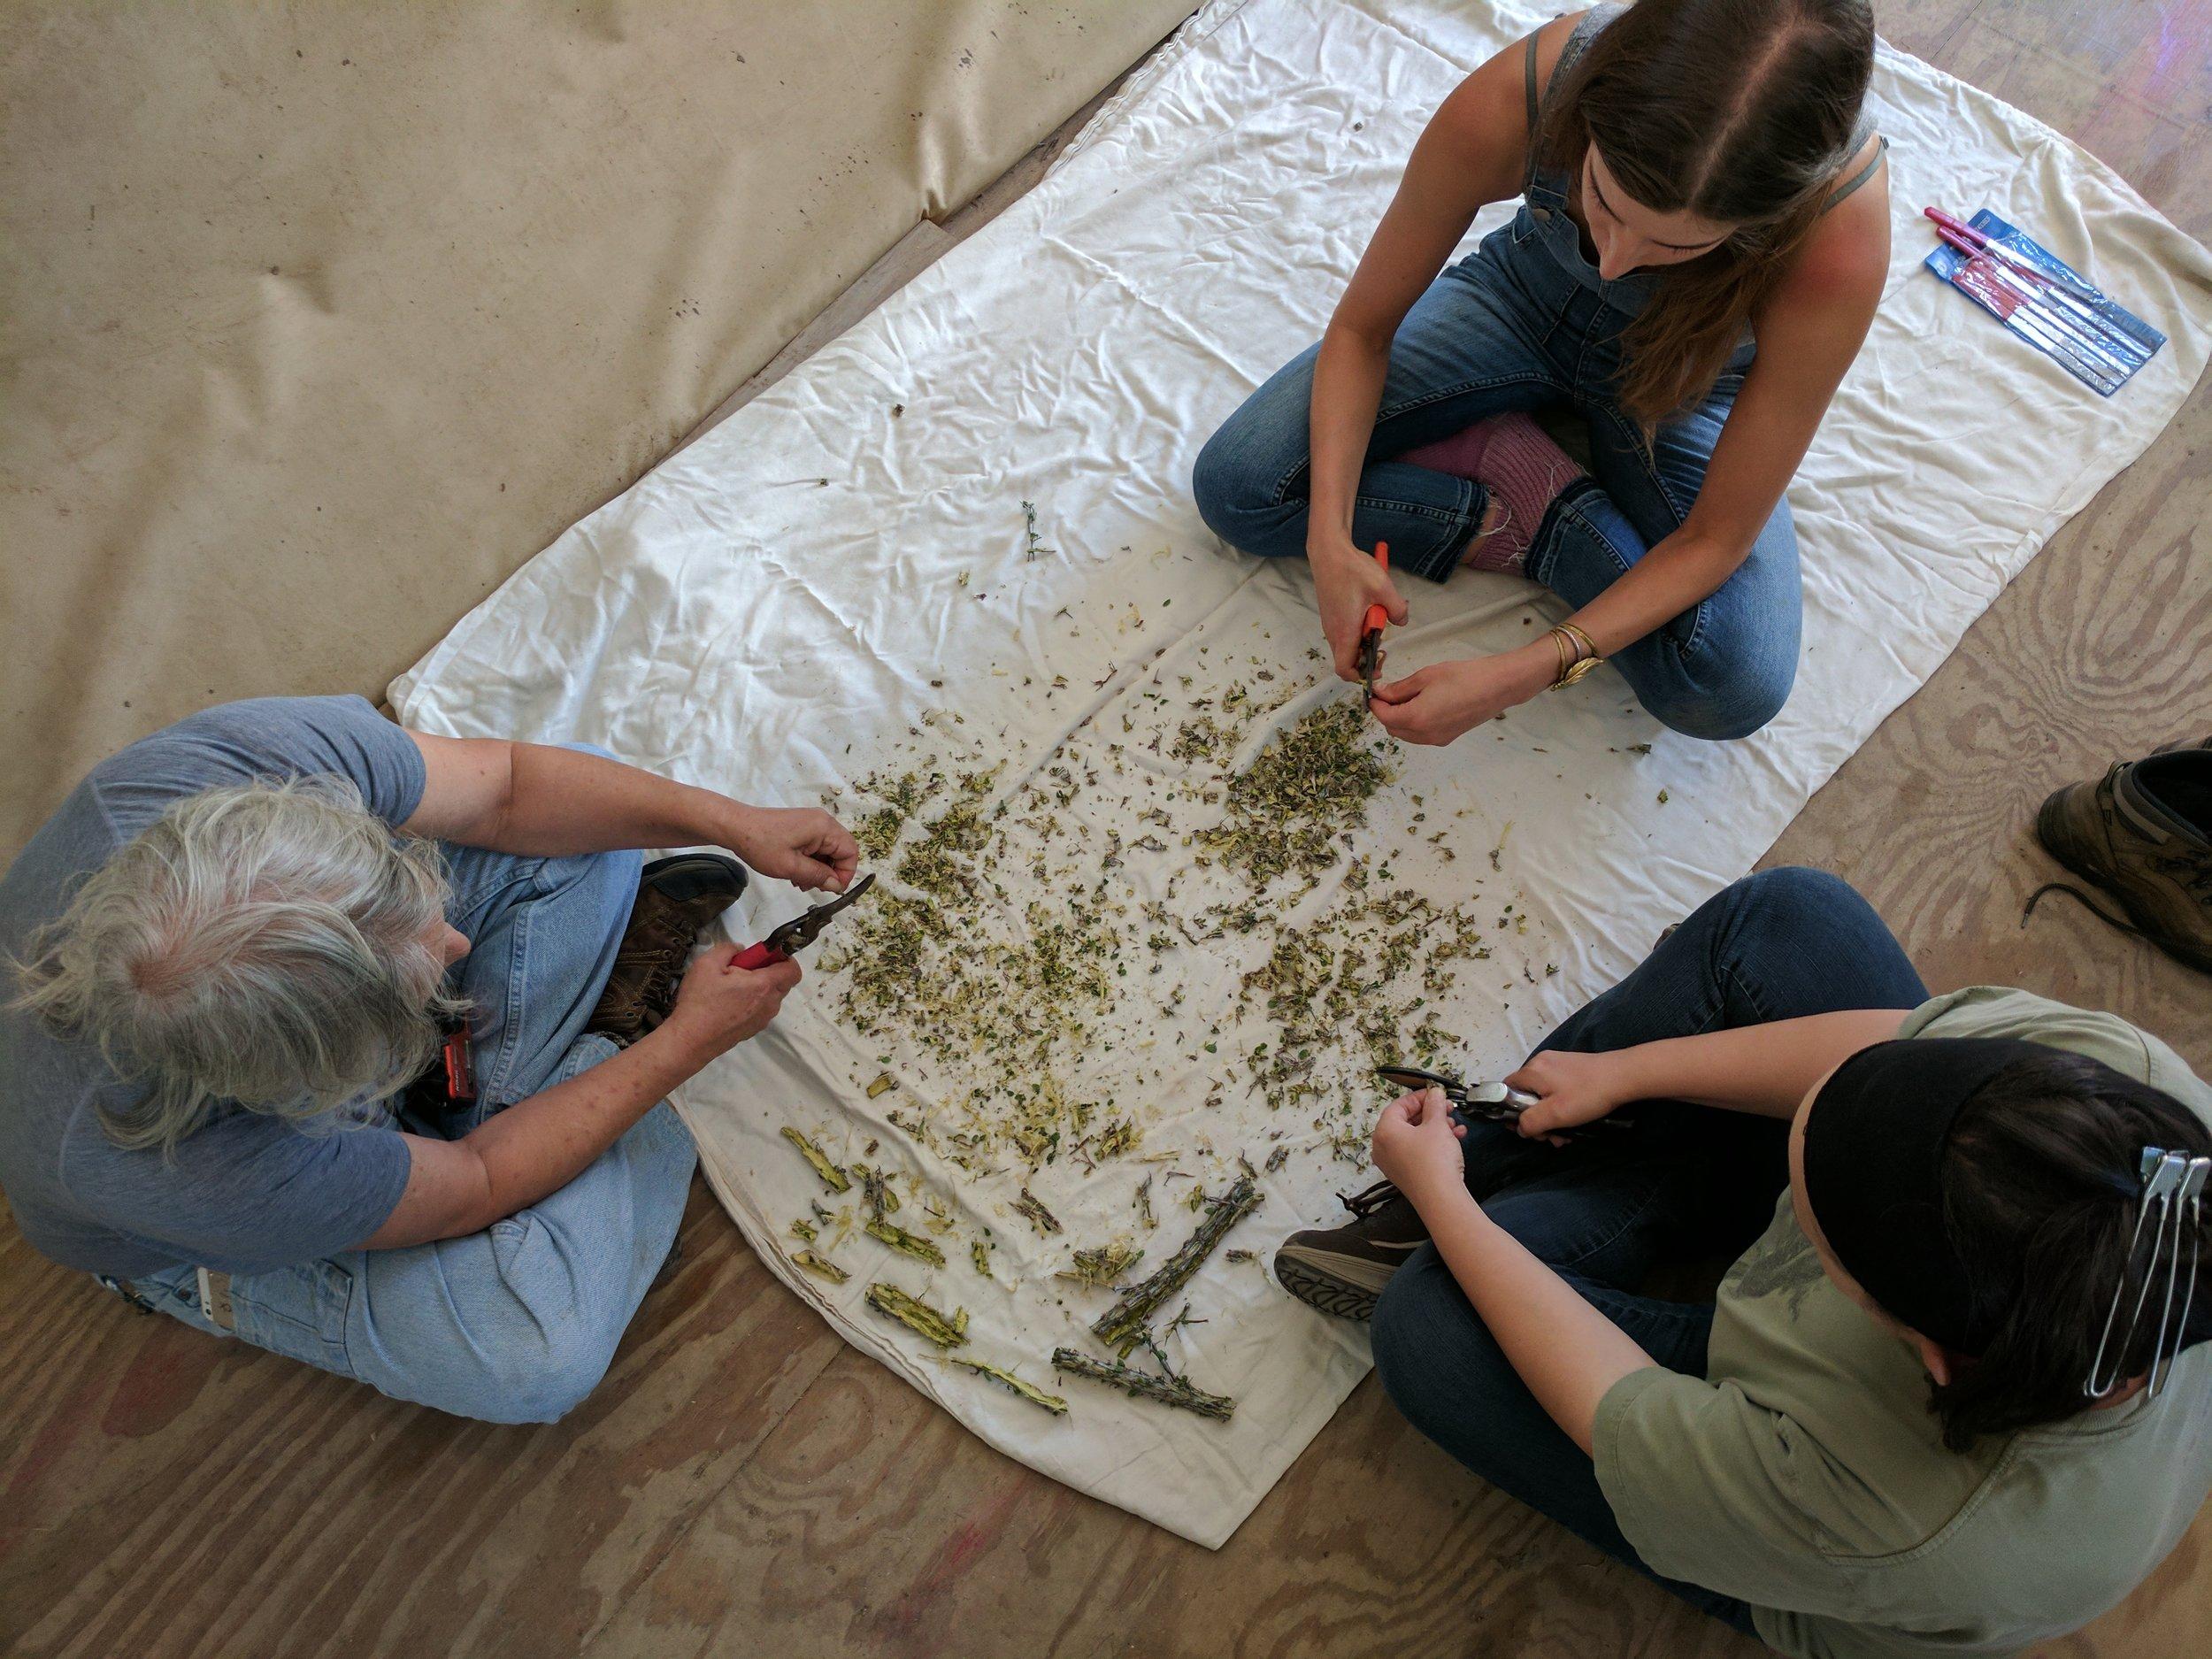 Processing Ocotillo bark for tincture